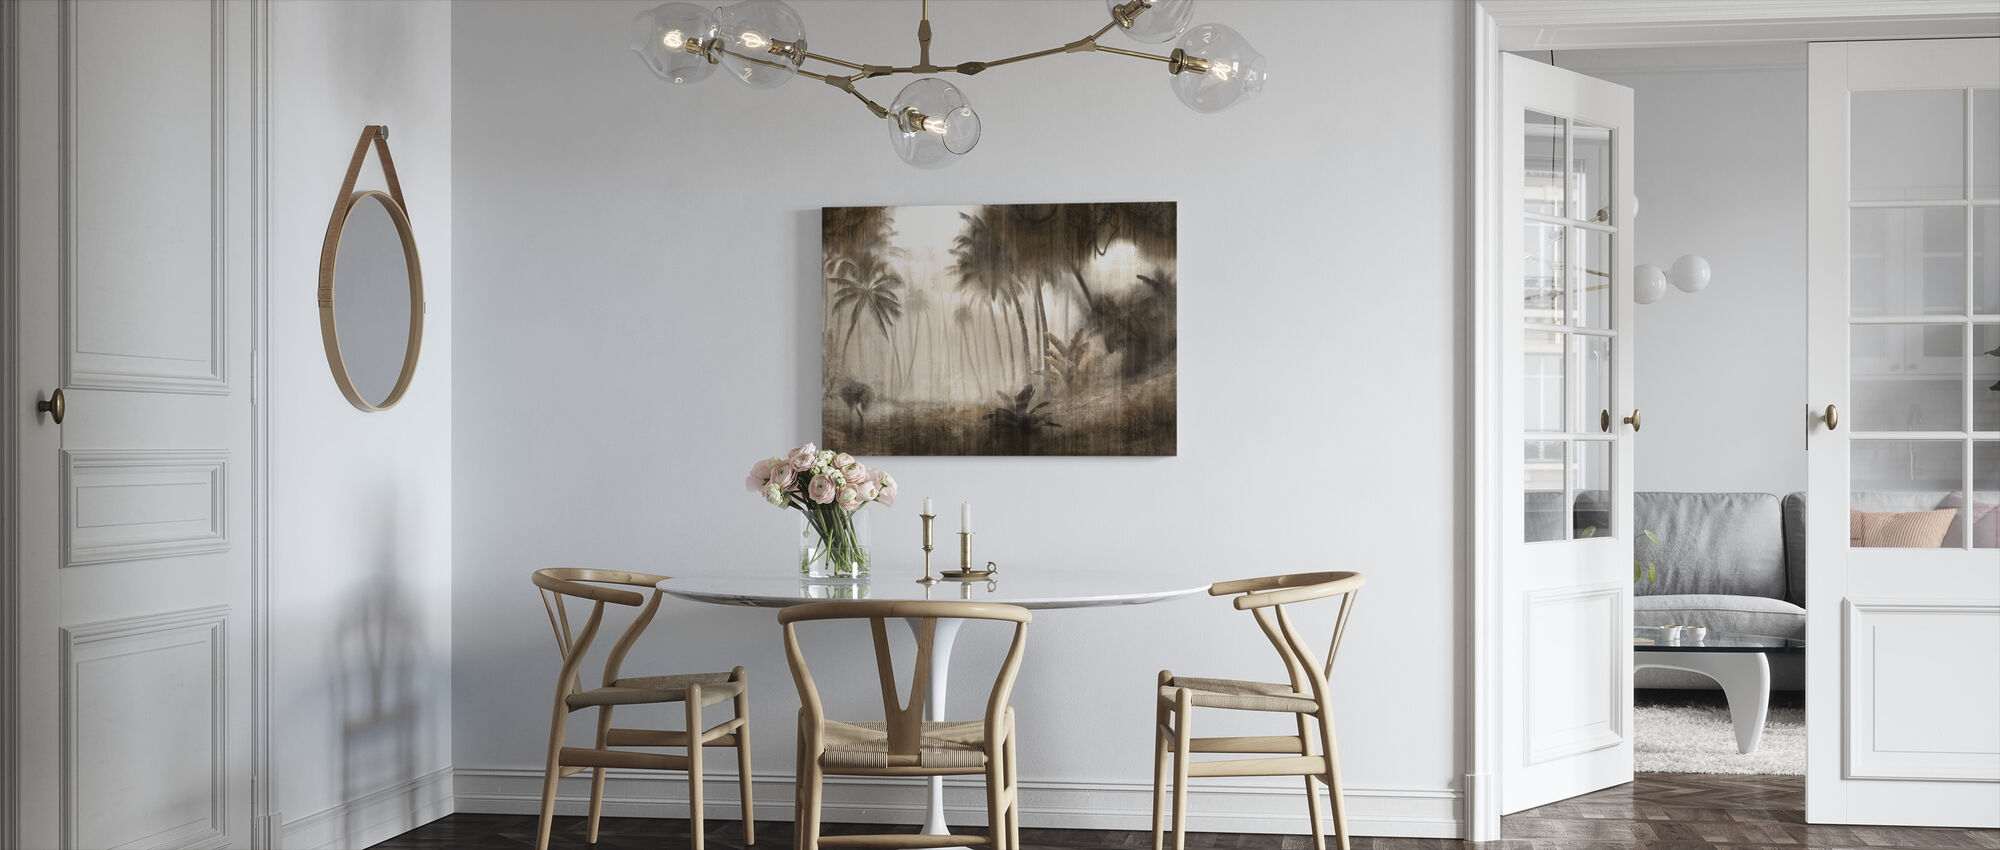 Definitive Tropical - Hazel - Canvas print - Kitchen